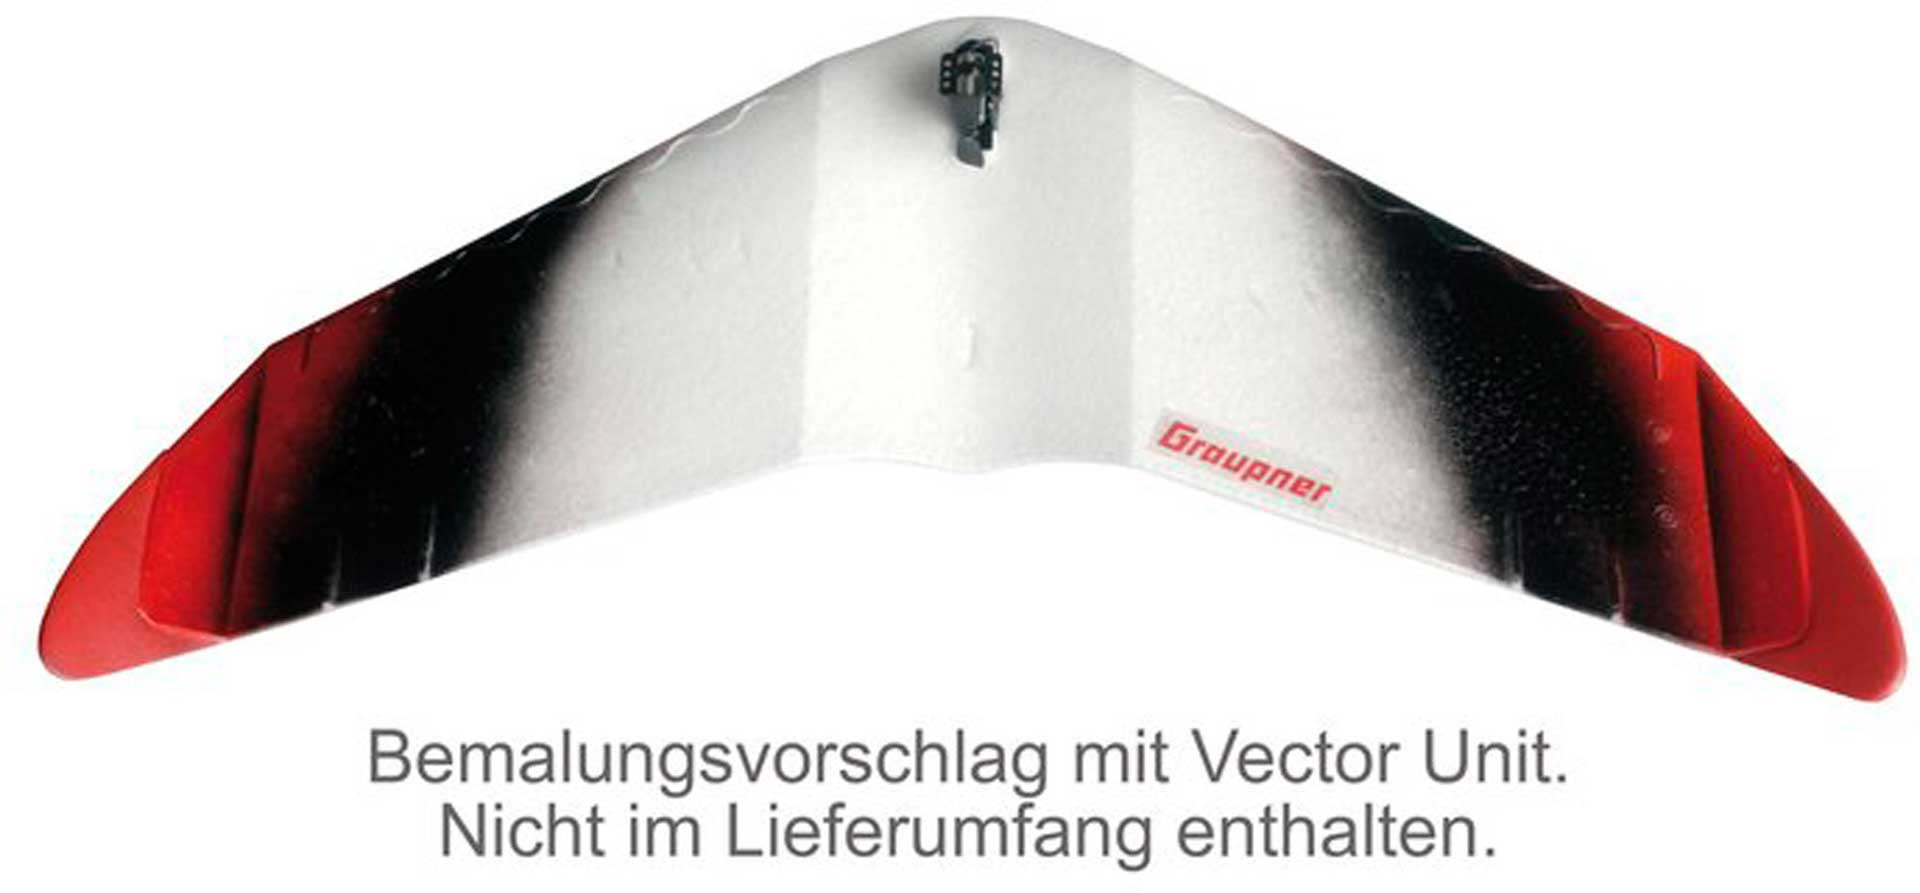 GRAUPNER VECTOR WING VECTOR PLANES FREIFLUGMODELL OPTIONAL FÜR R/C BETRIEB